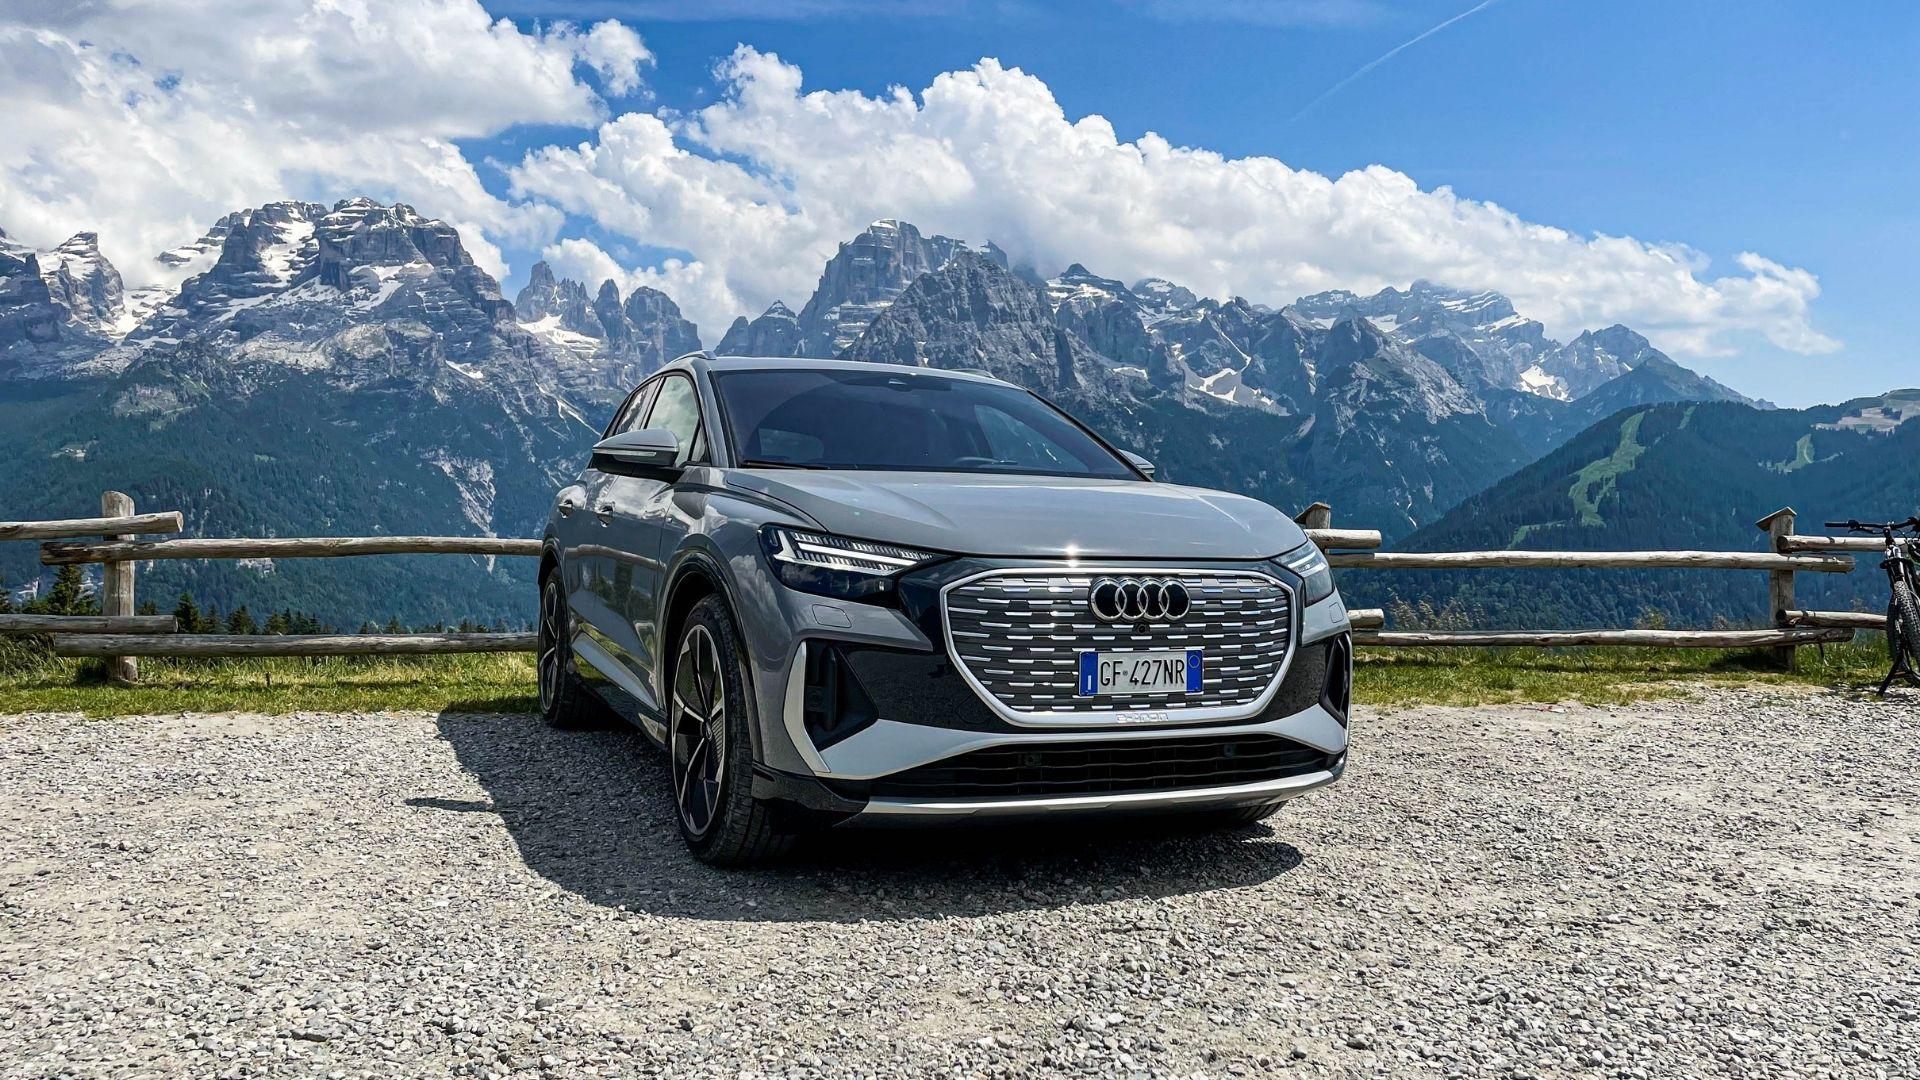 Audi-Q4-e-tron-dolomiti